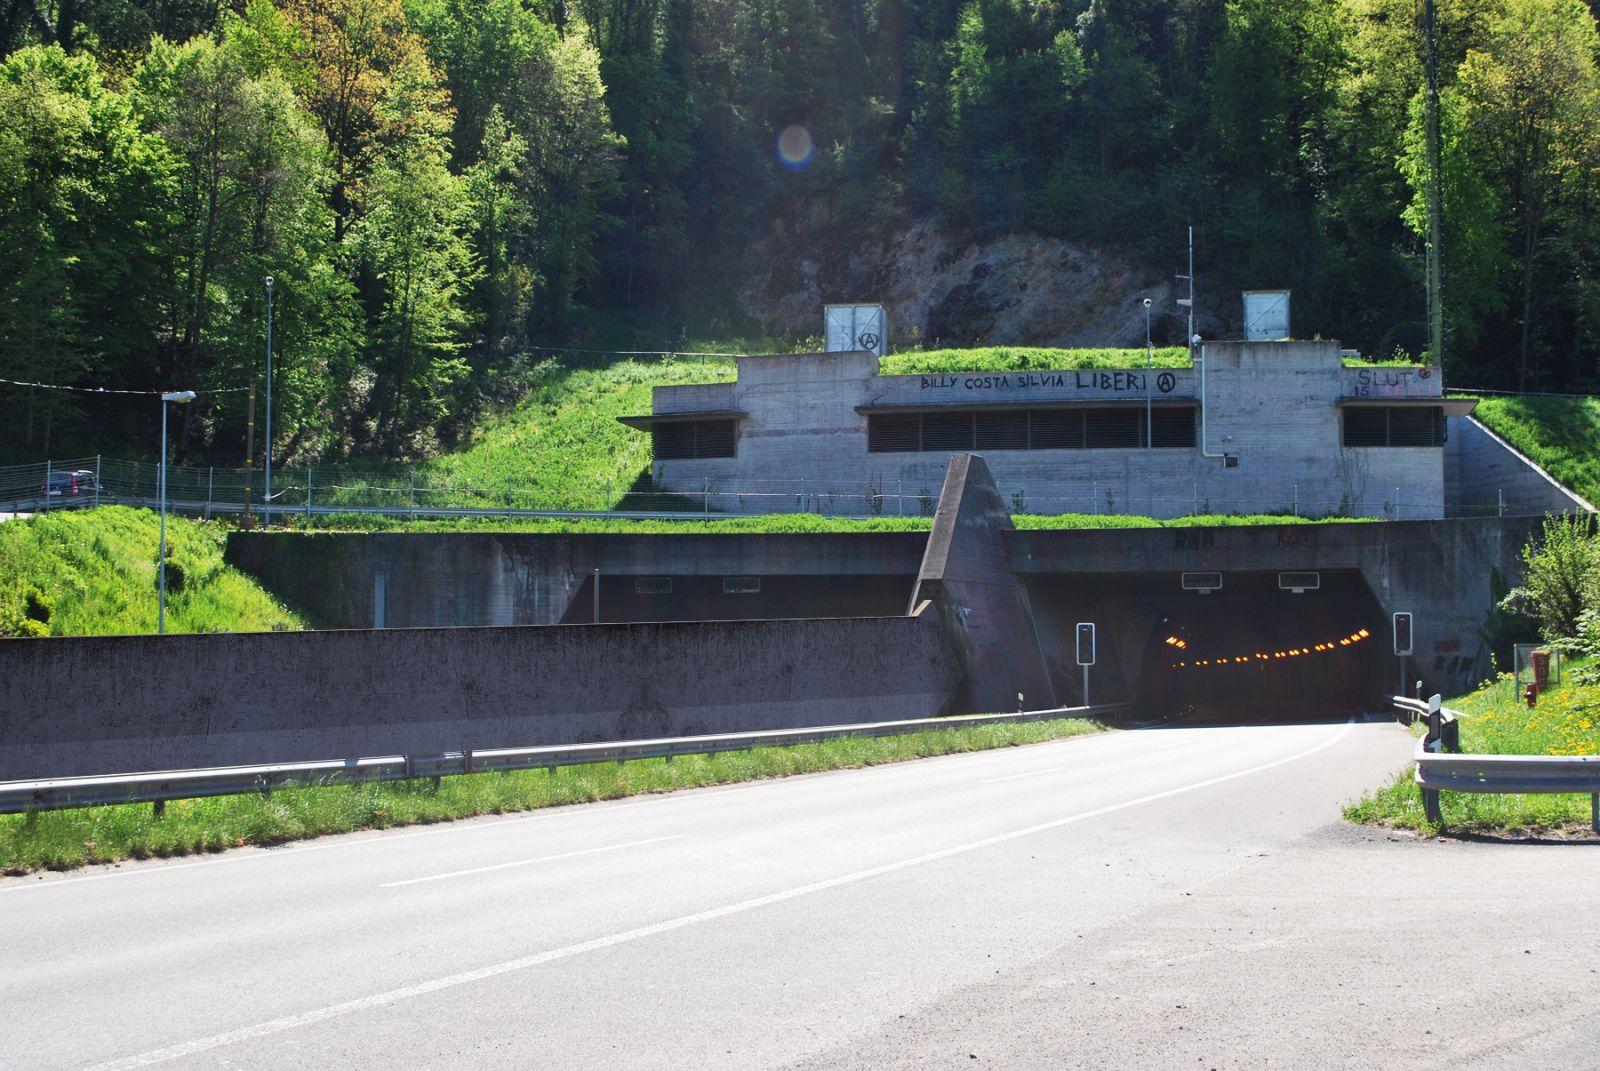 Ticino Highway Guard Rail 742